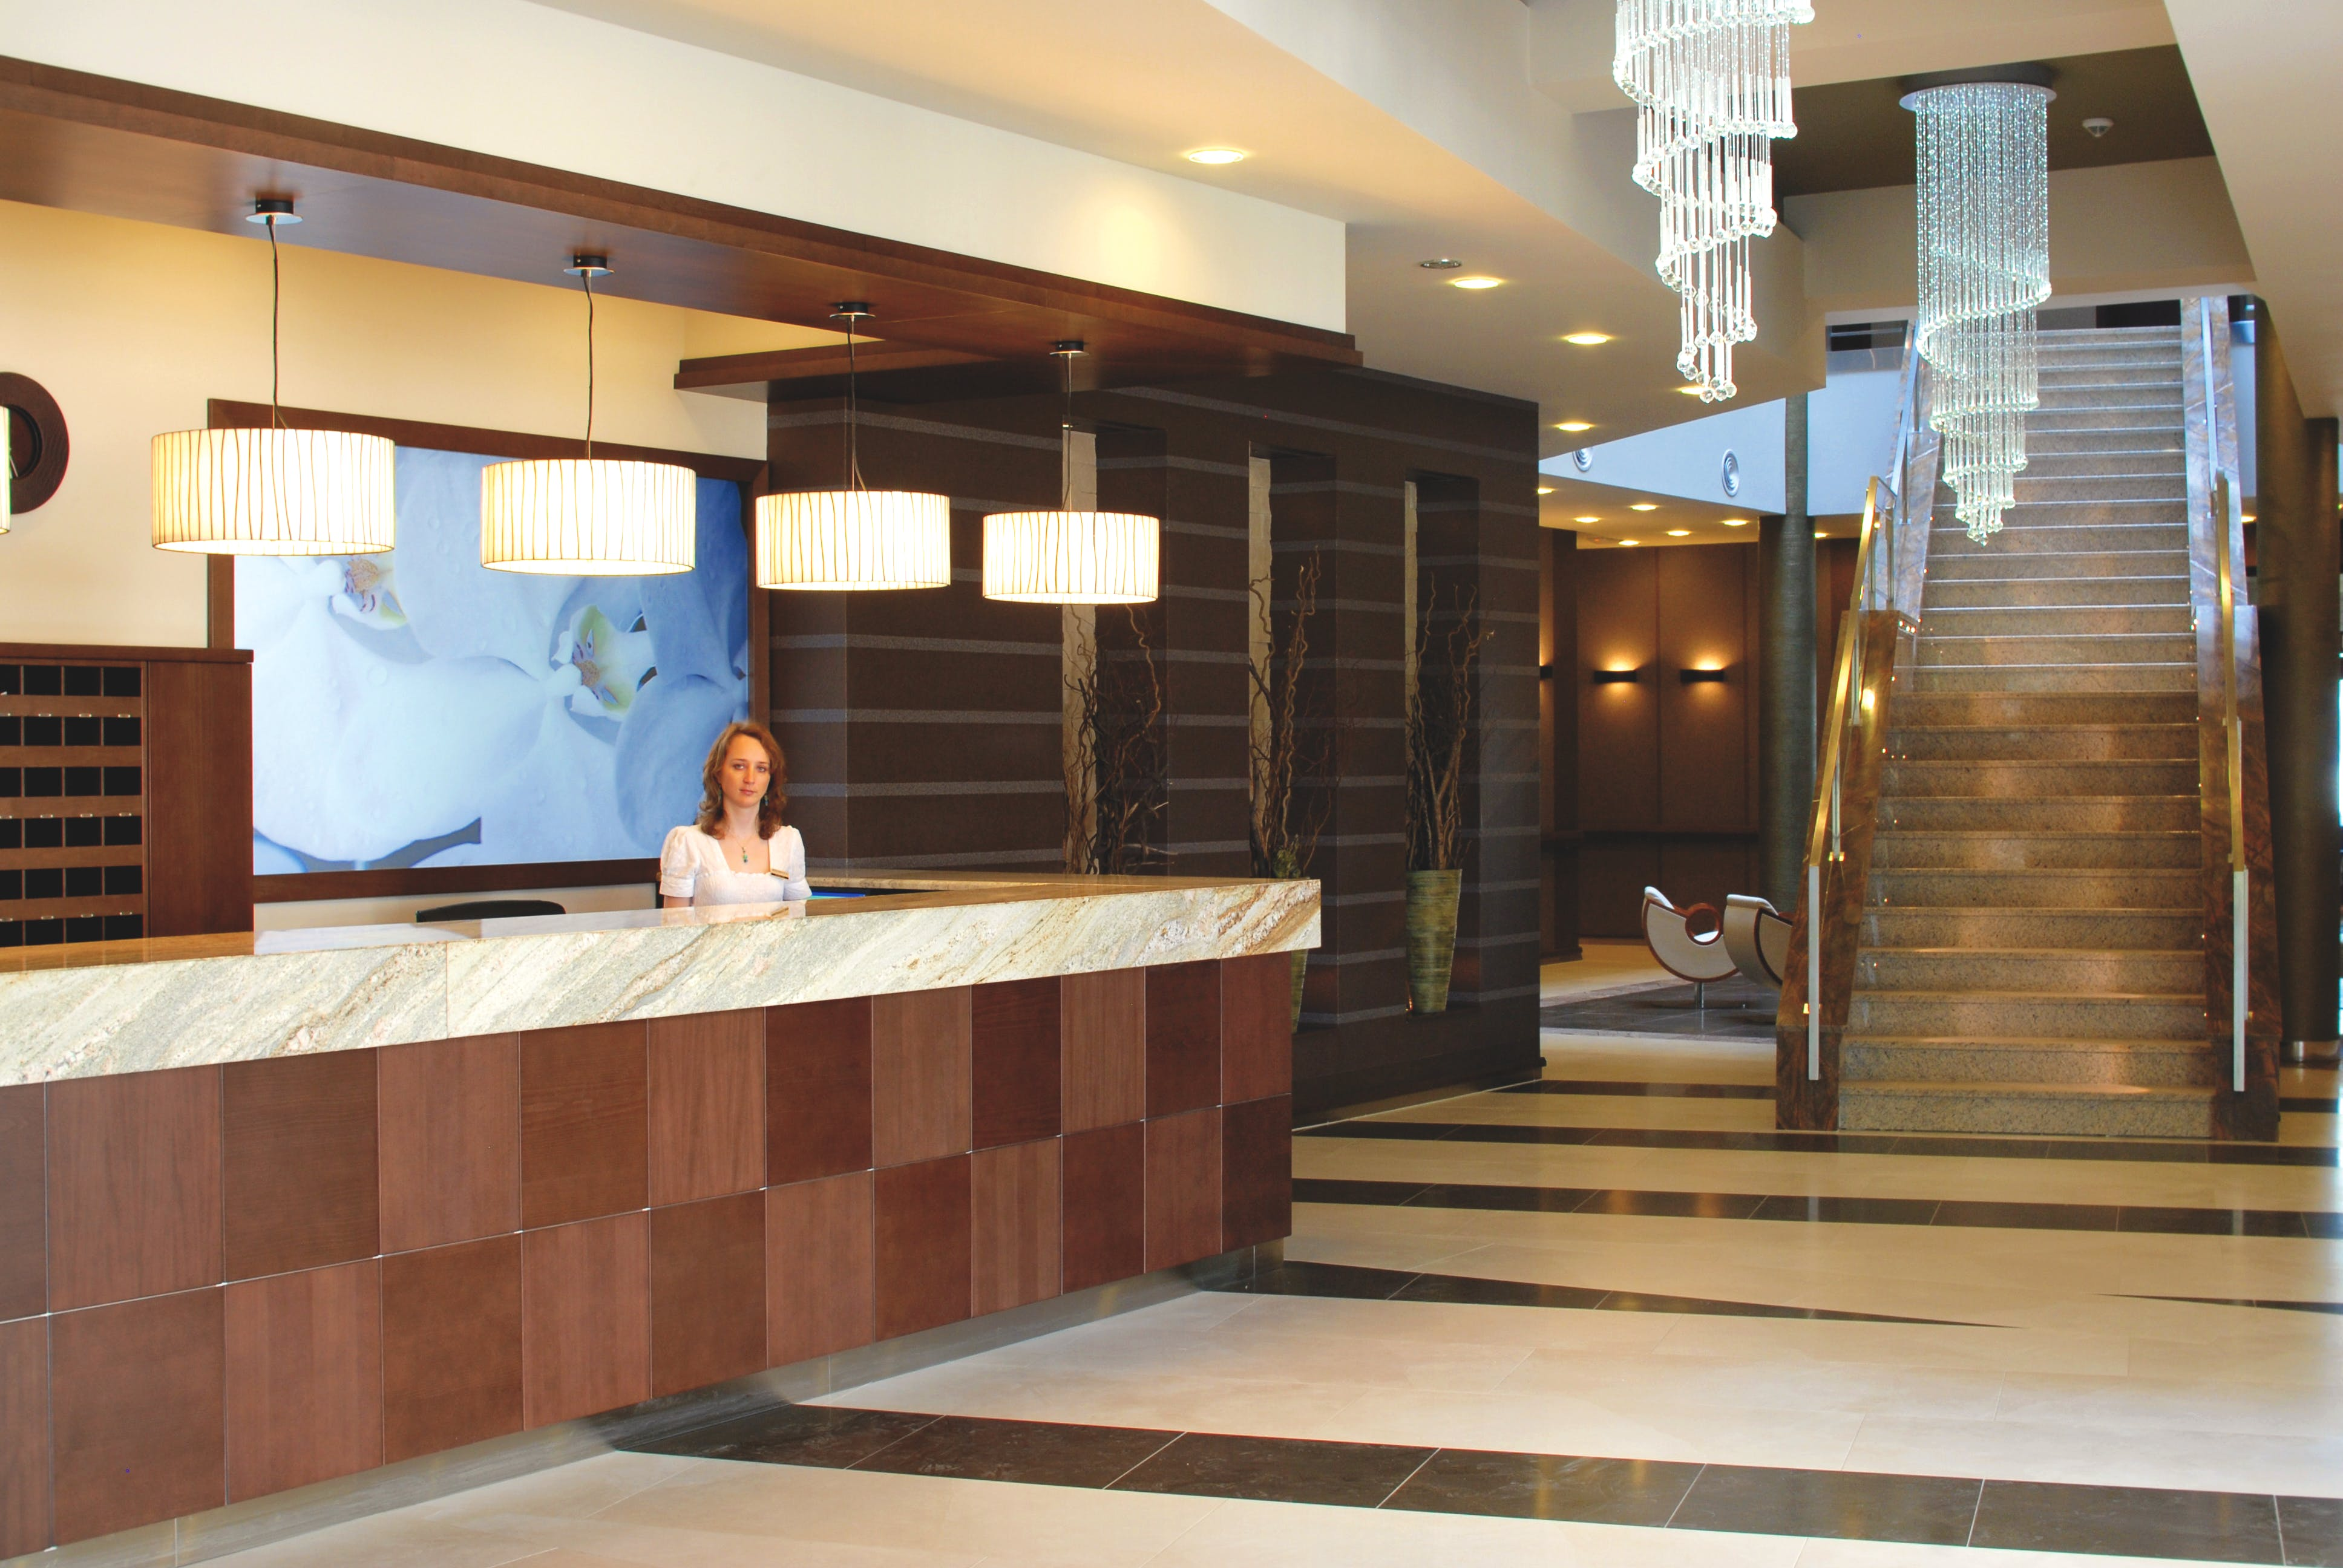 best choice look out for new lifestyle Kur & Wellness in Polen - Kurhotel Olymp 2 in Kolberg an der Ostsee